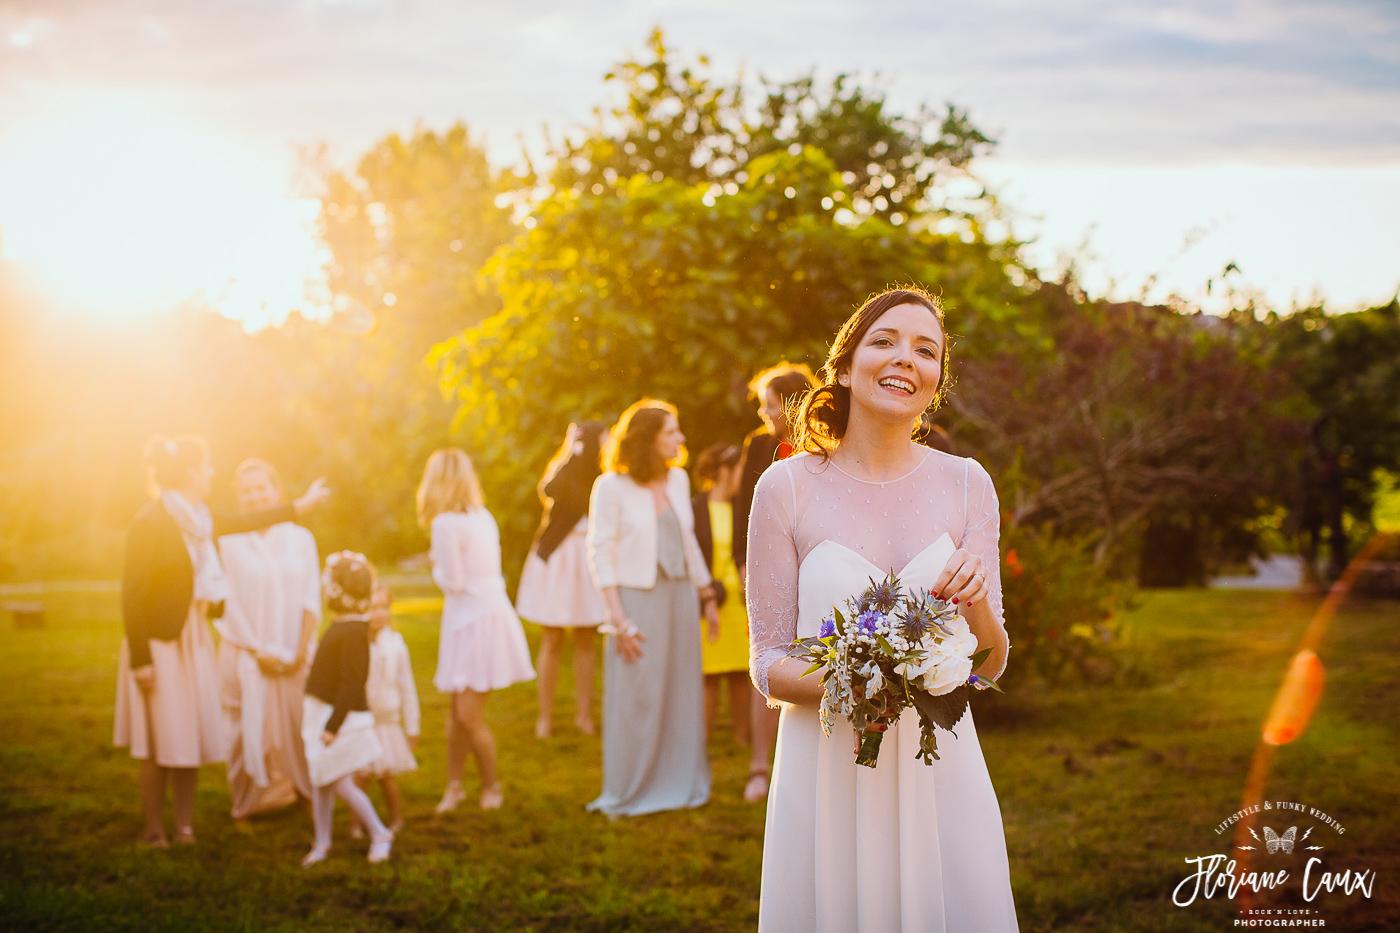 photographe-mariage-pays-basque-Floriane-Caux (85)